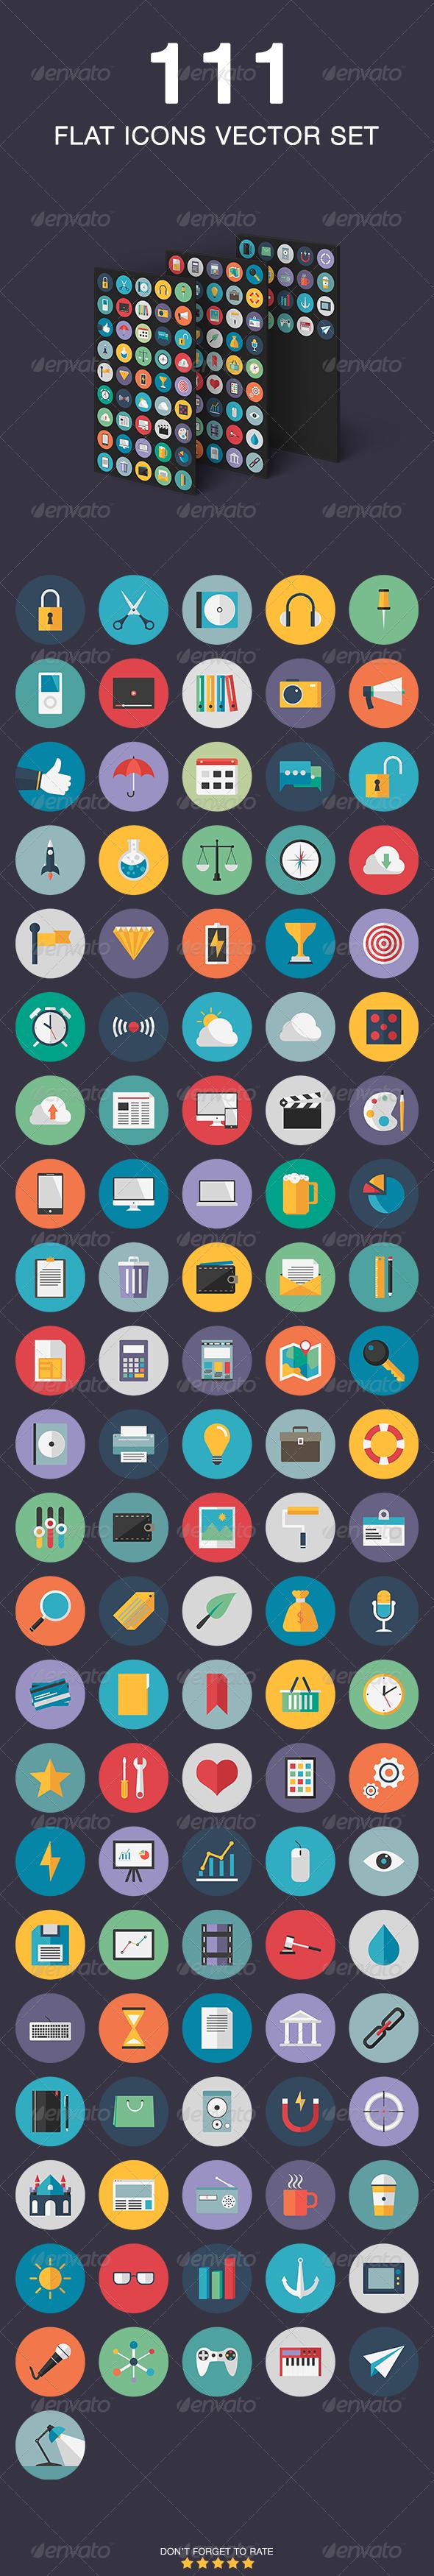 Flat Icons Vector Set - Web Icons